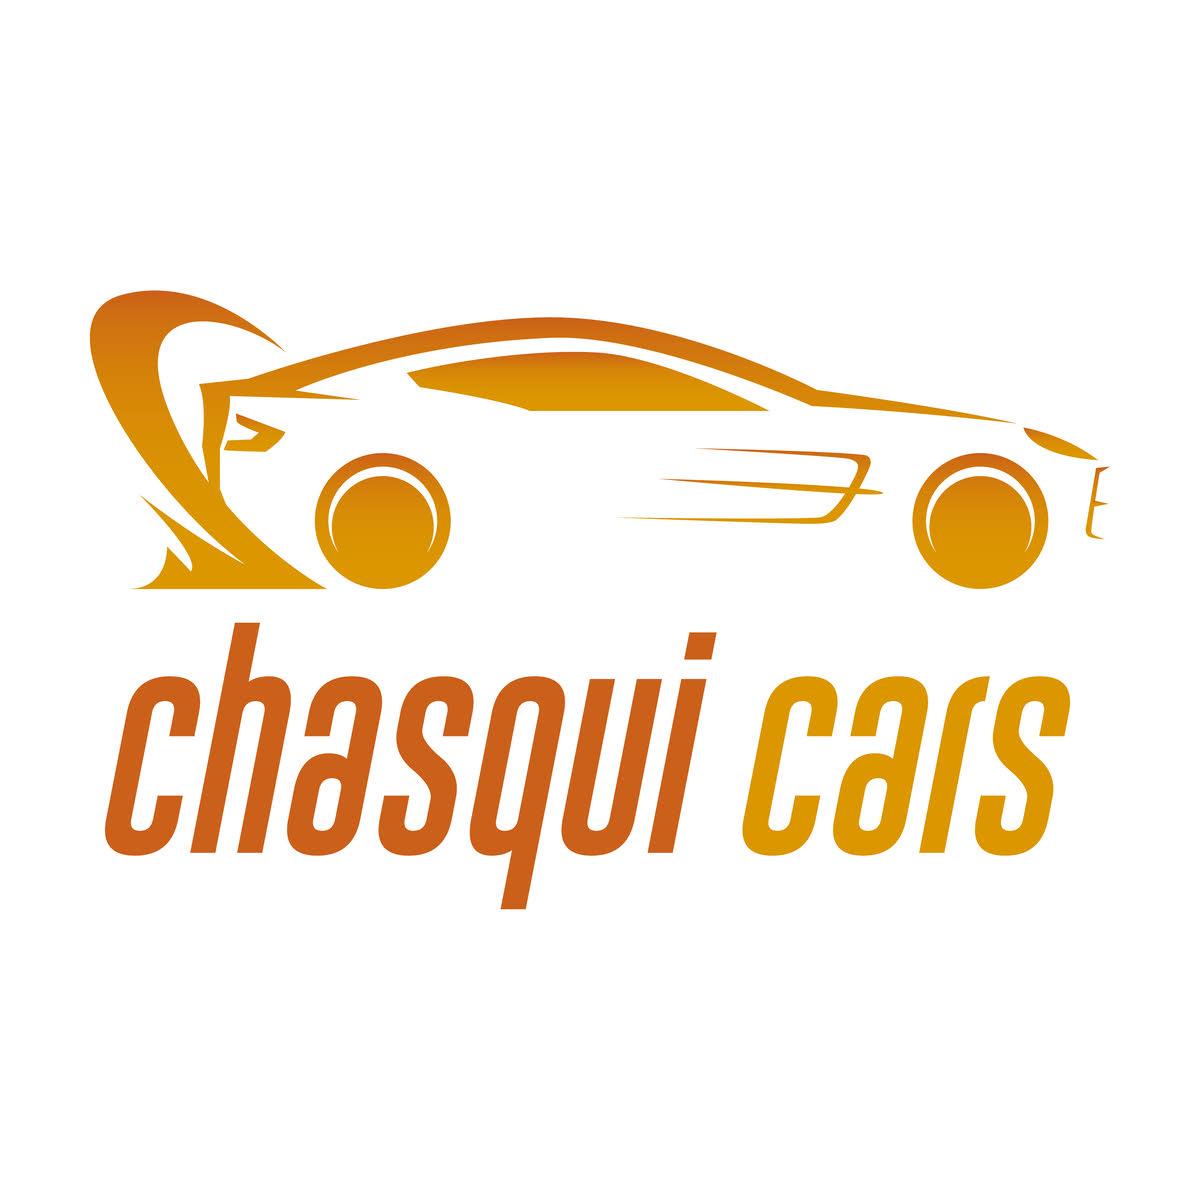 Chasqui Cars Llc San Antonio Tx Read Consumer Reviews